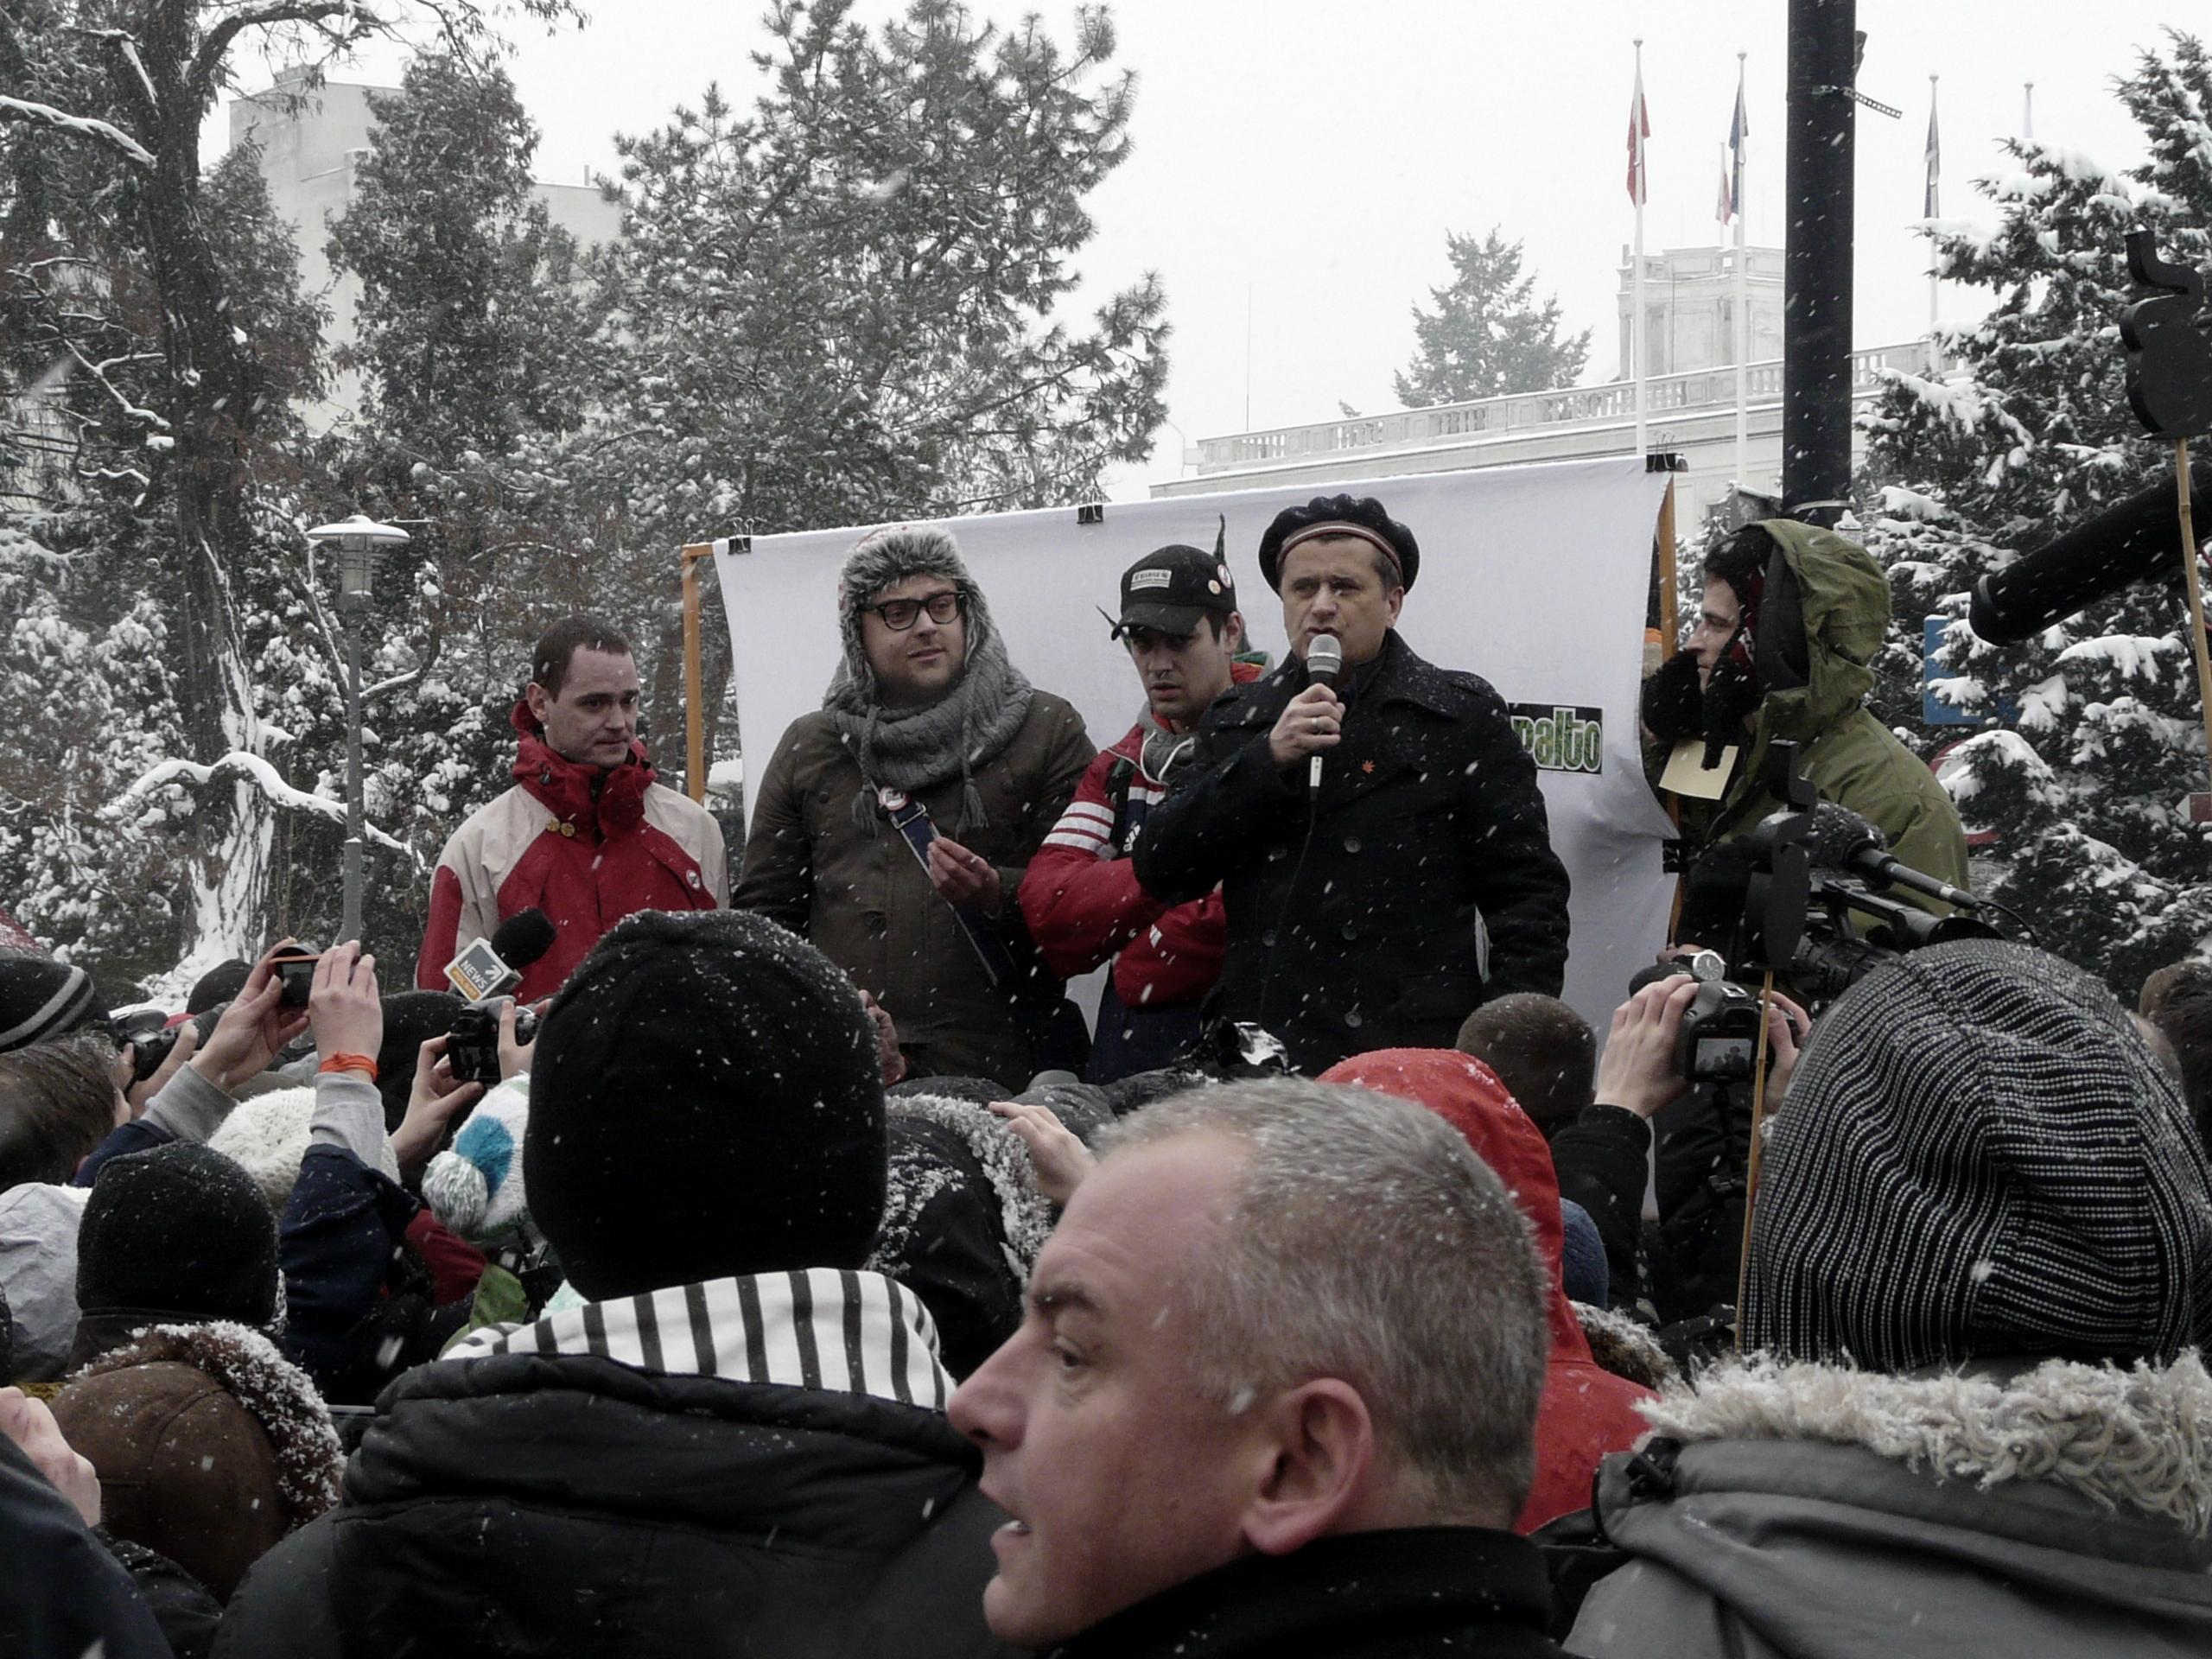 Akcja pod Sejmem (17.02.2012)